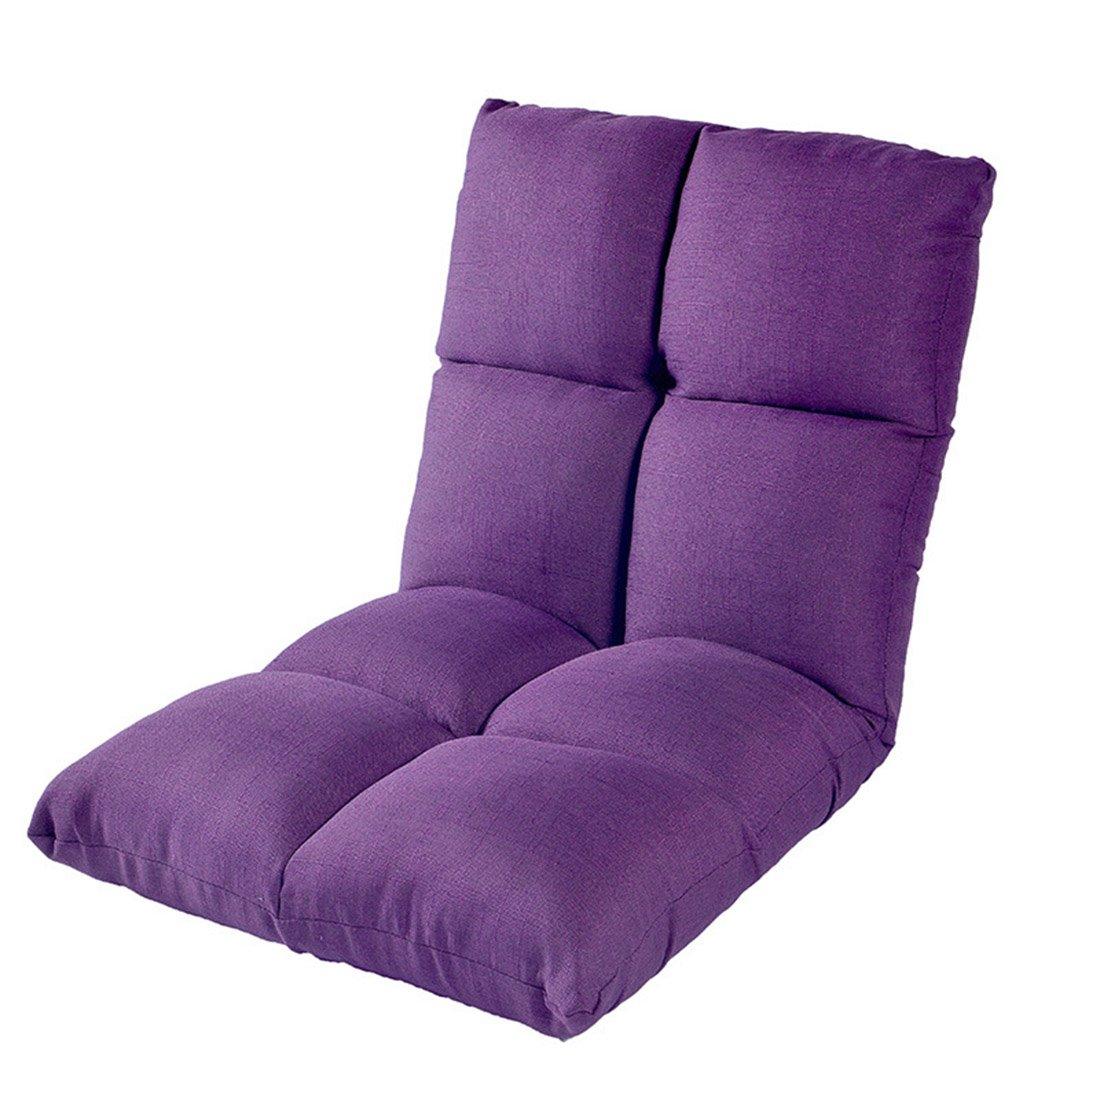 Jiyaru Adjustable Floor Chair Home Gaming Cushion Seat Folding Lazy Sofa Purple